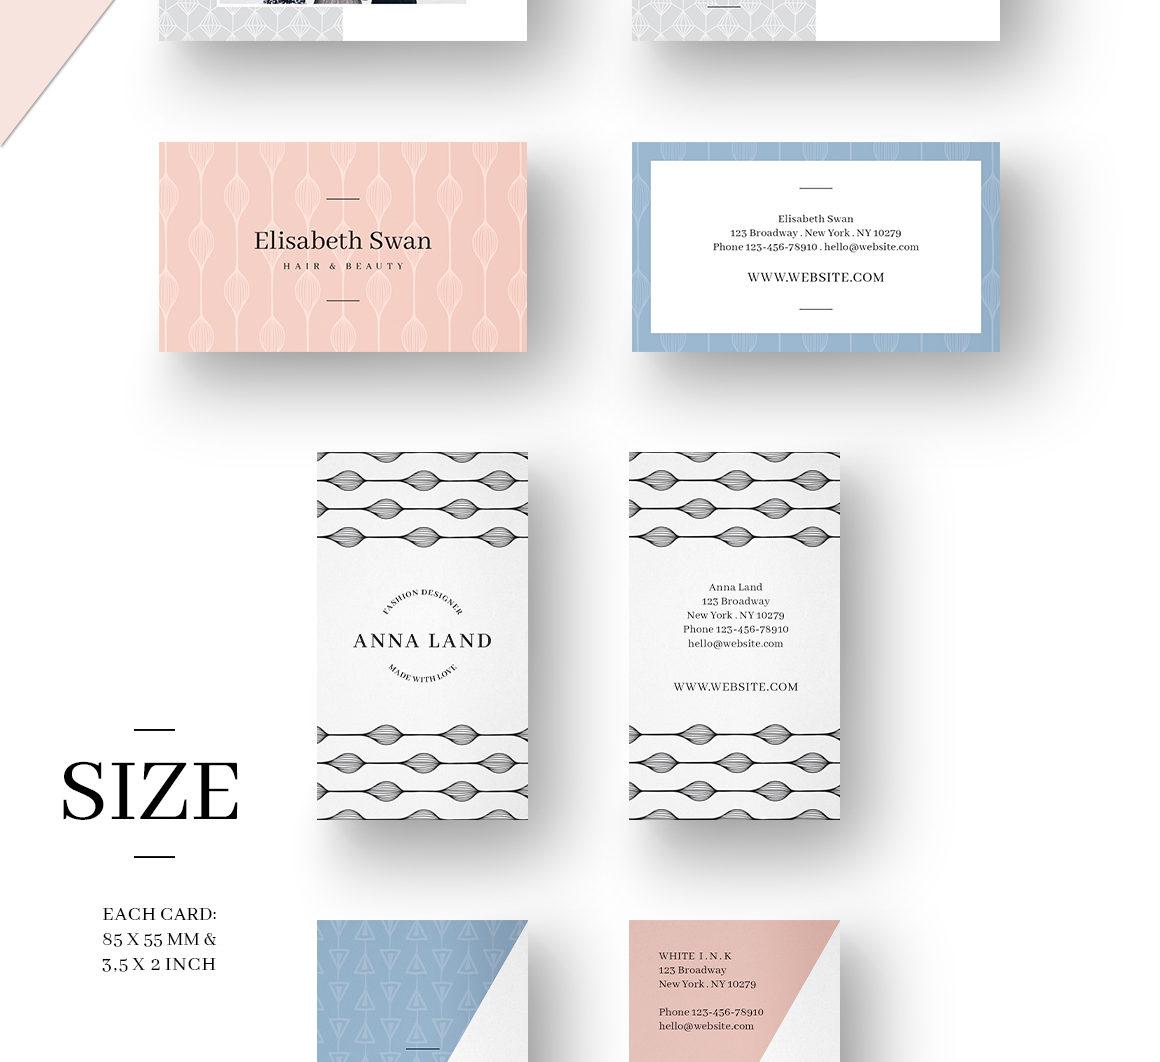 MALINA Business Cards + Logos + Seamless Patterns - Unbenannt 5 scaled -